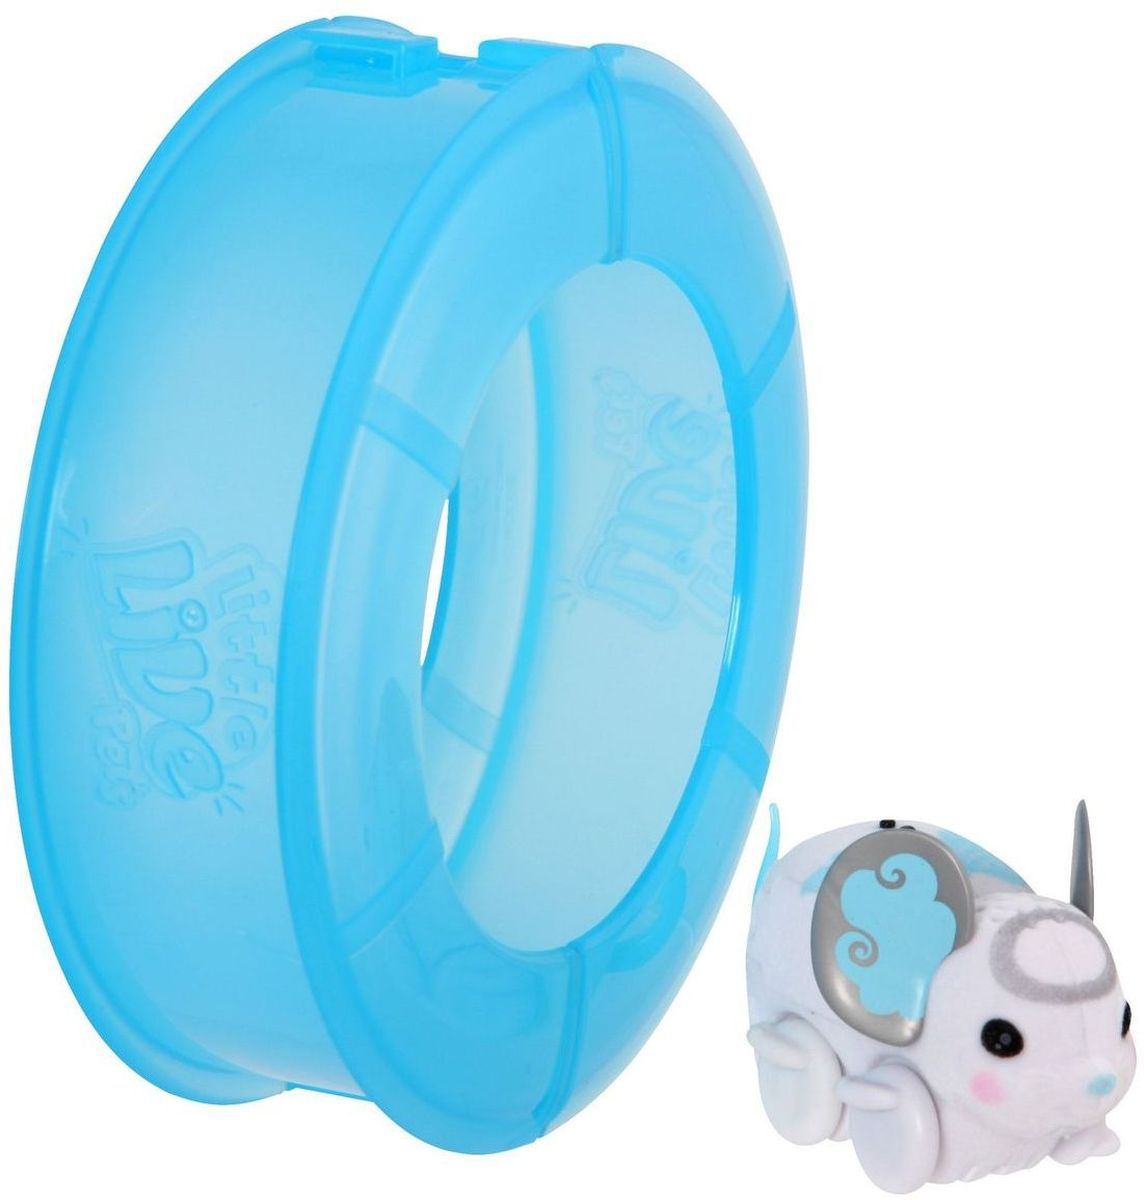 Little Live Pets Интерактивная игрушка Мышка в колесе цвет белый - Интерактивные игрушки